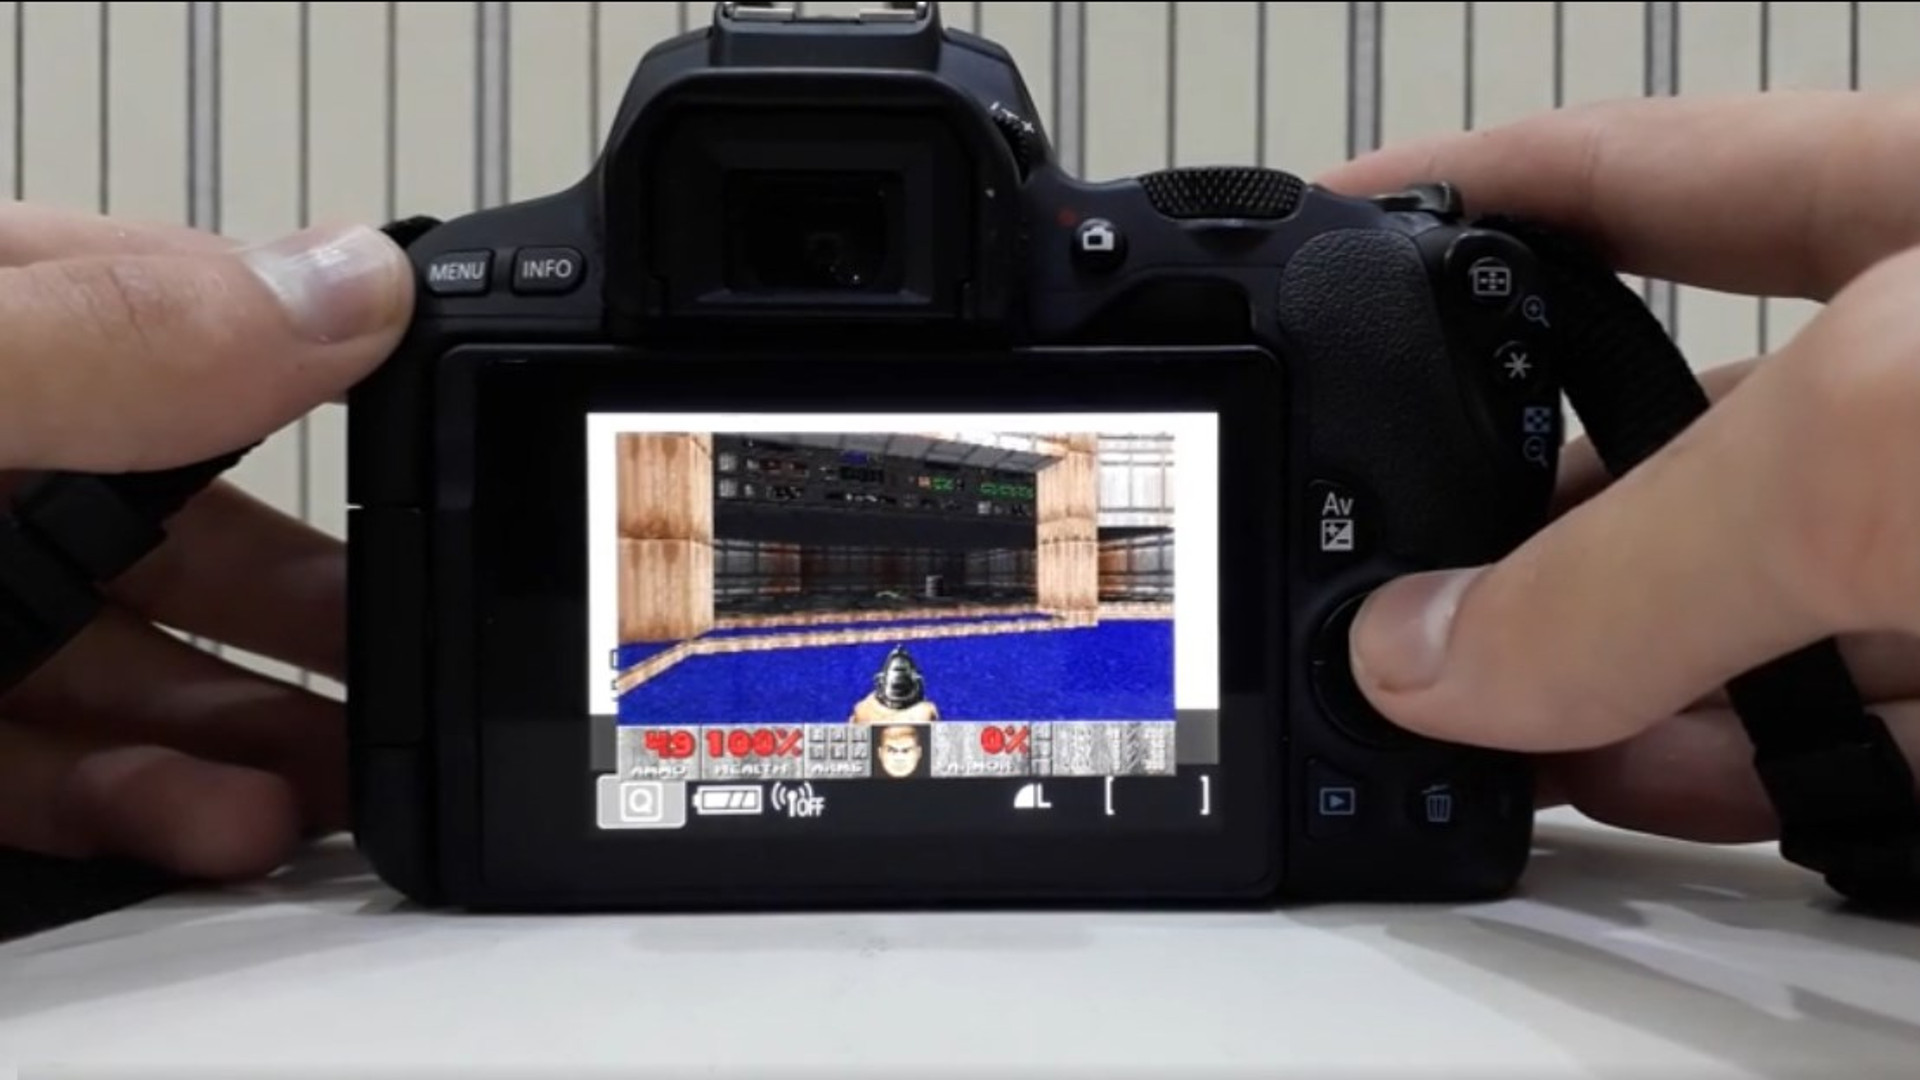 Here's Doom on a digital camera